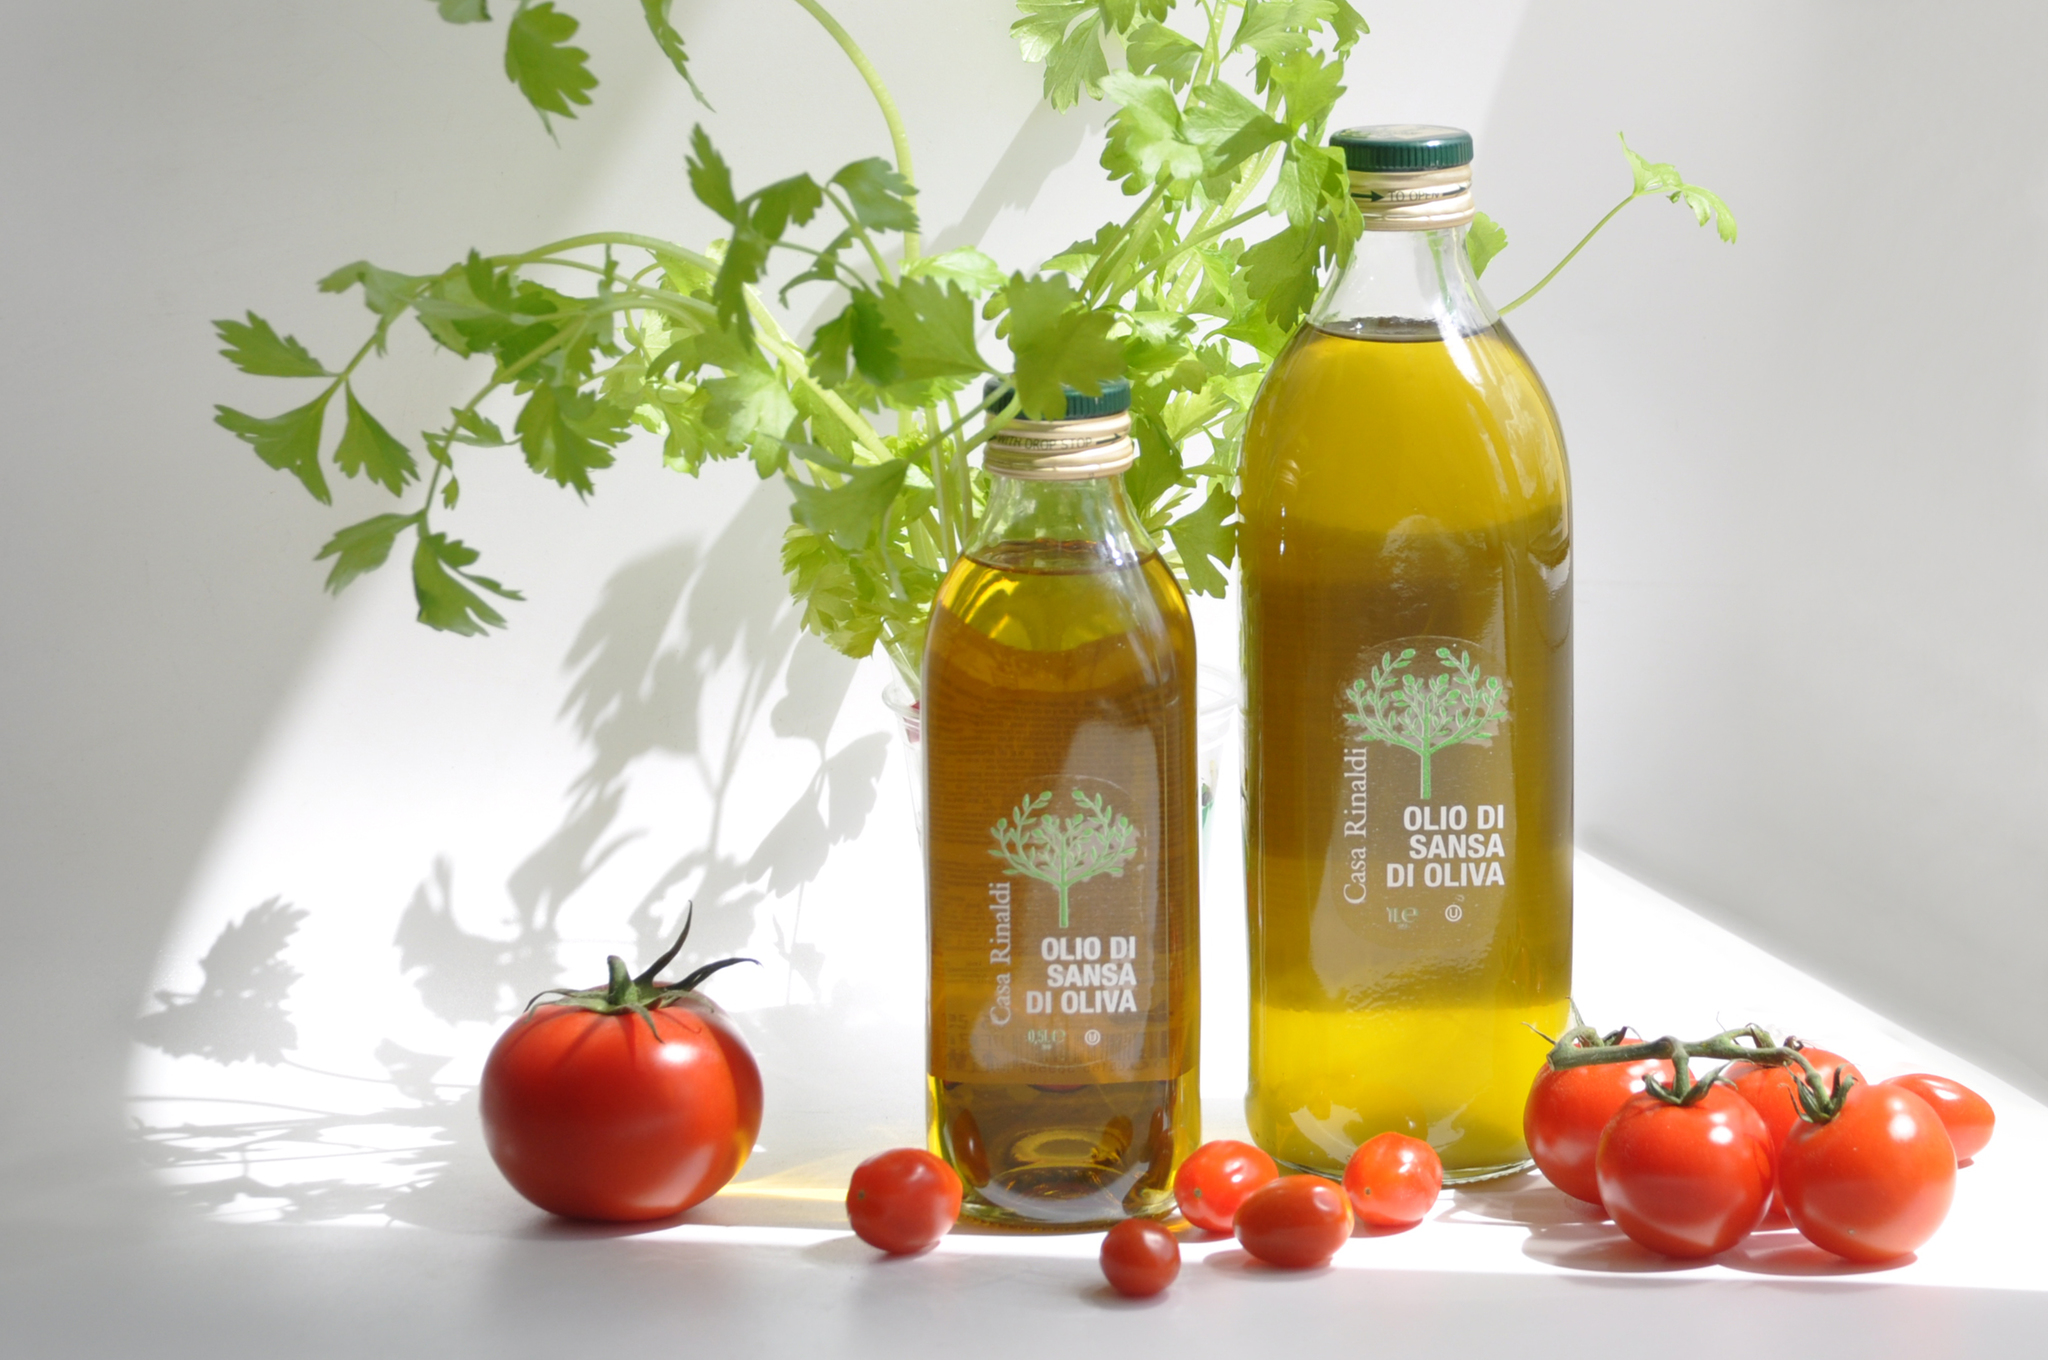 Масло оливковое рафинированное (OLIO DI SANSA E OLIVA)